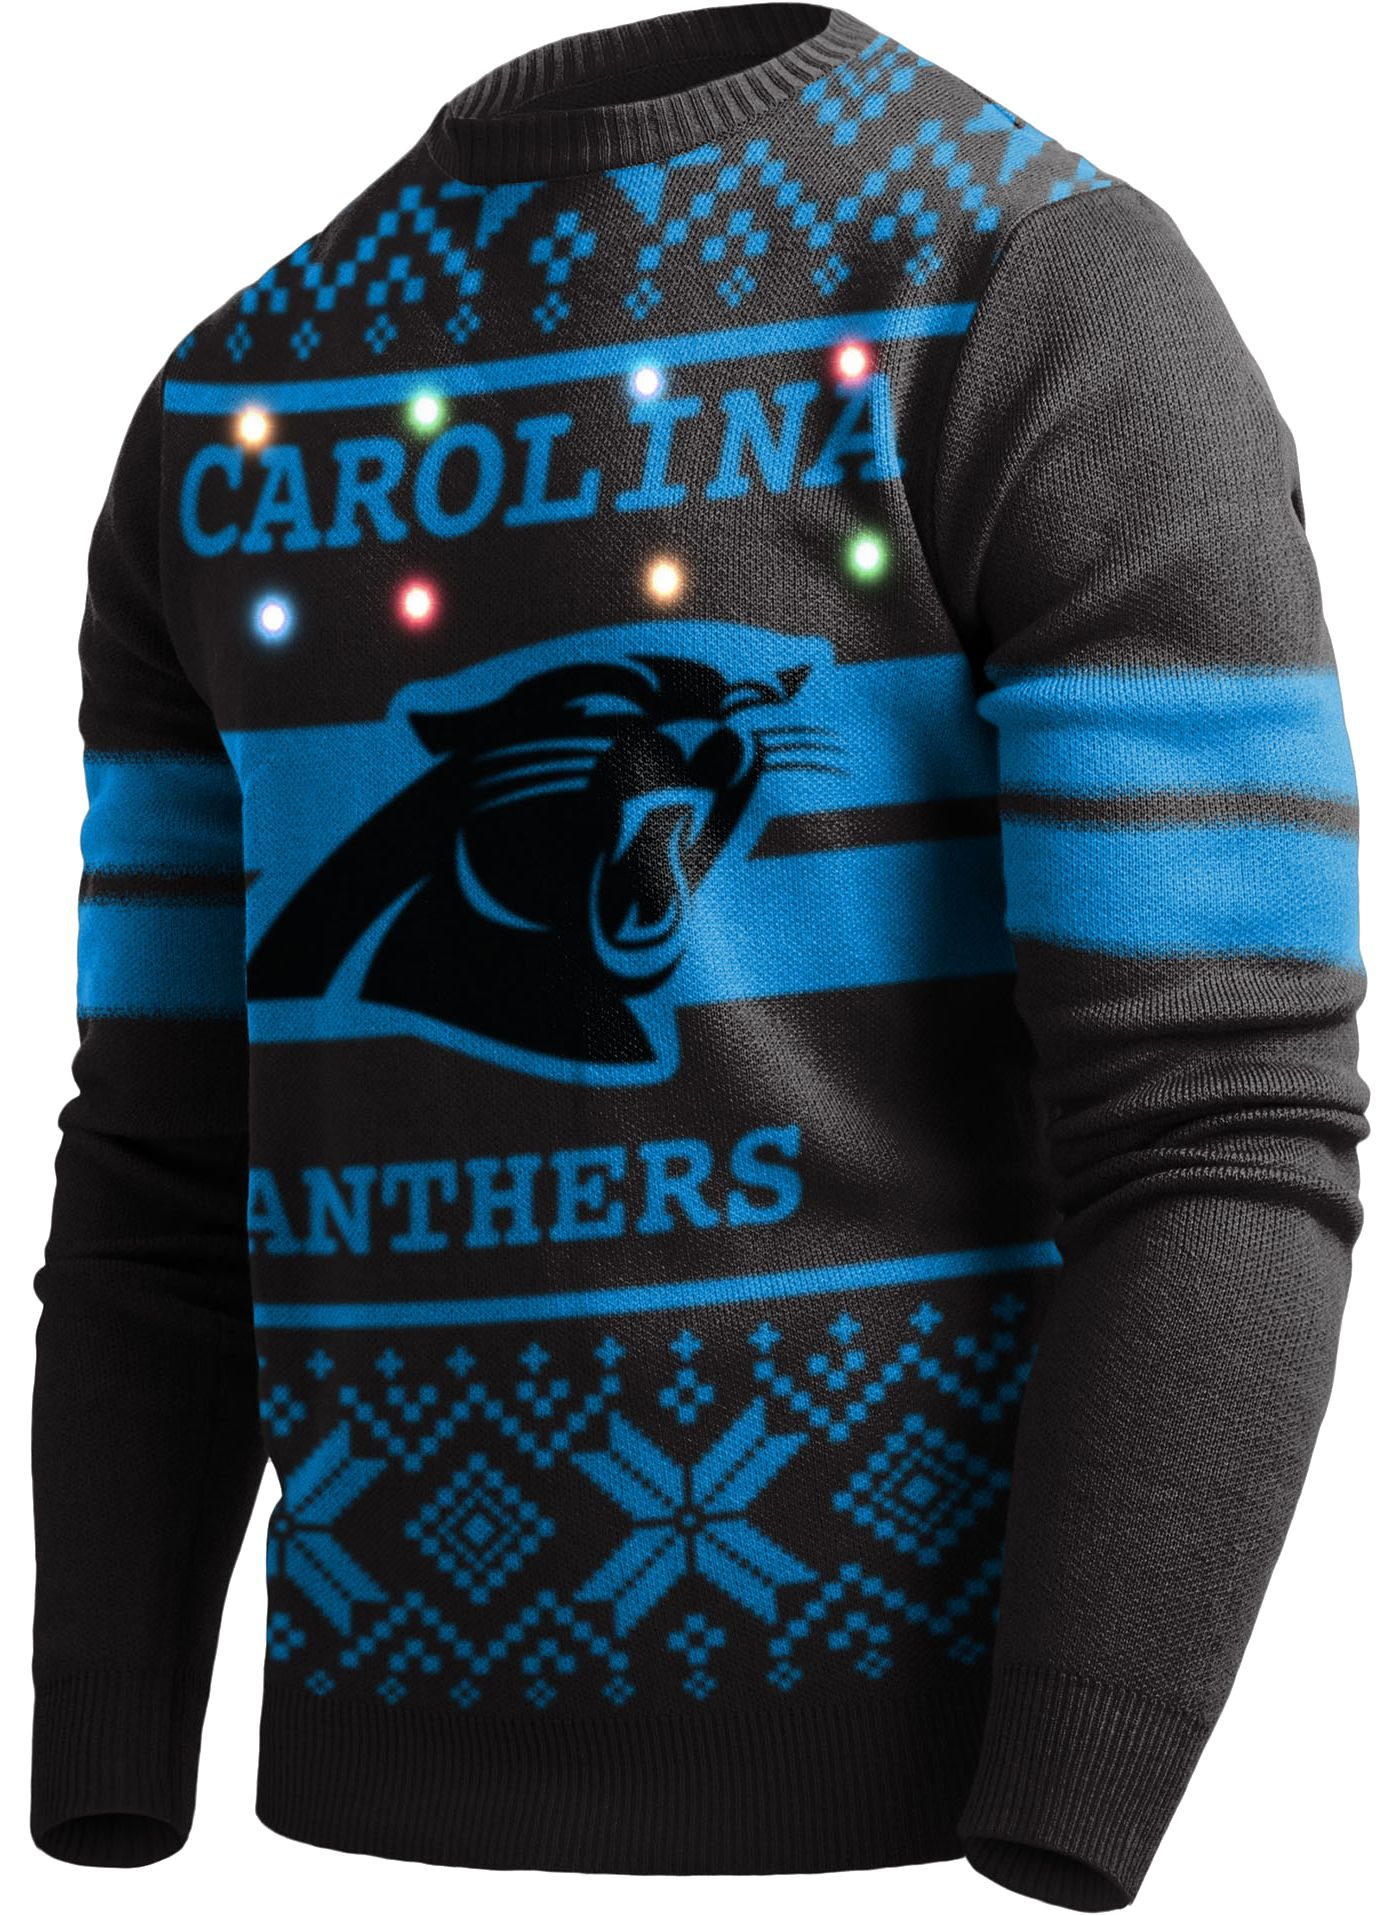 FOCO Men's Carolina Panthers Logo Stripe Light Up Black Ugly Sweater